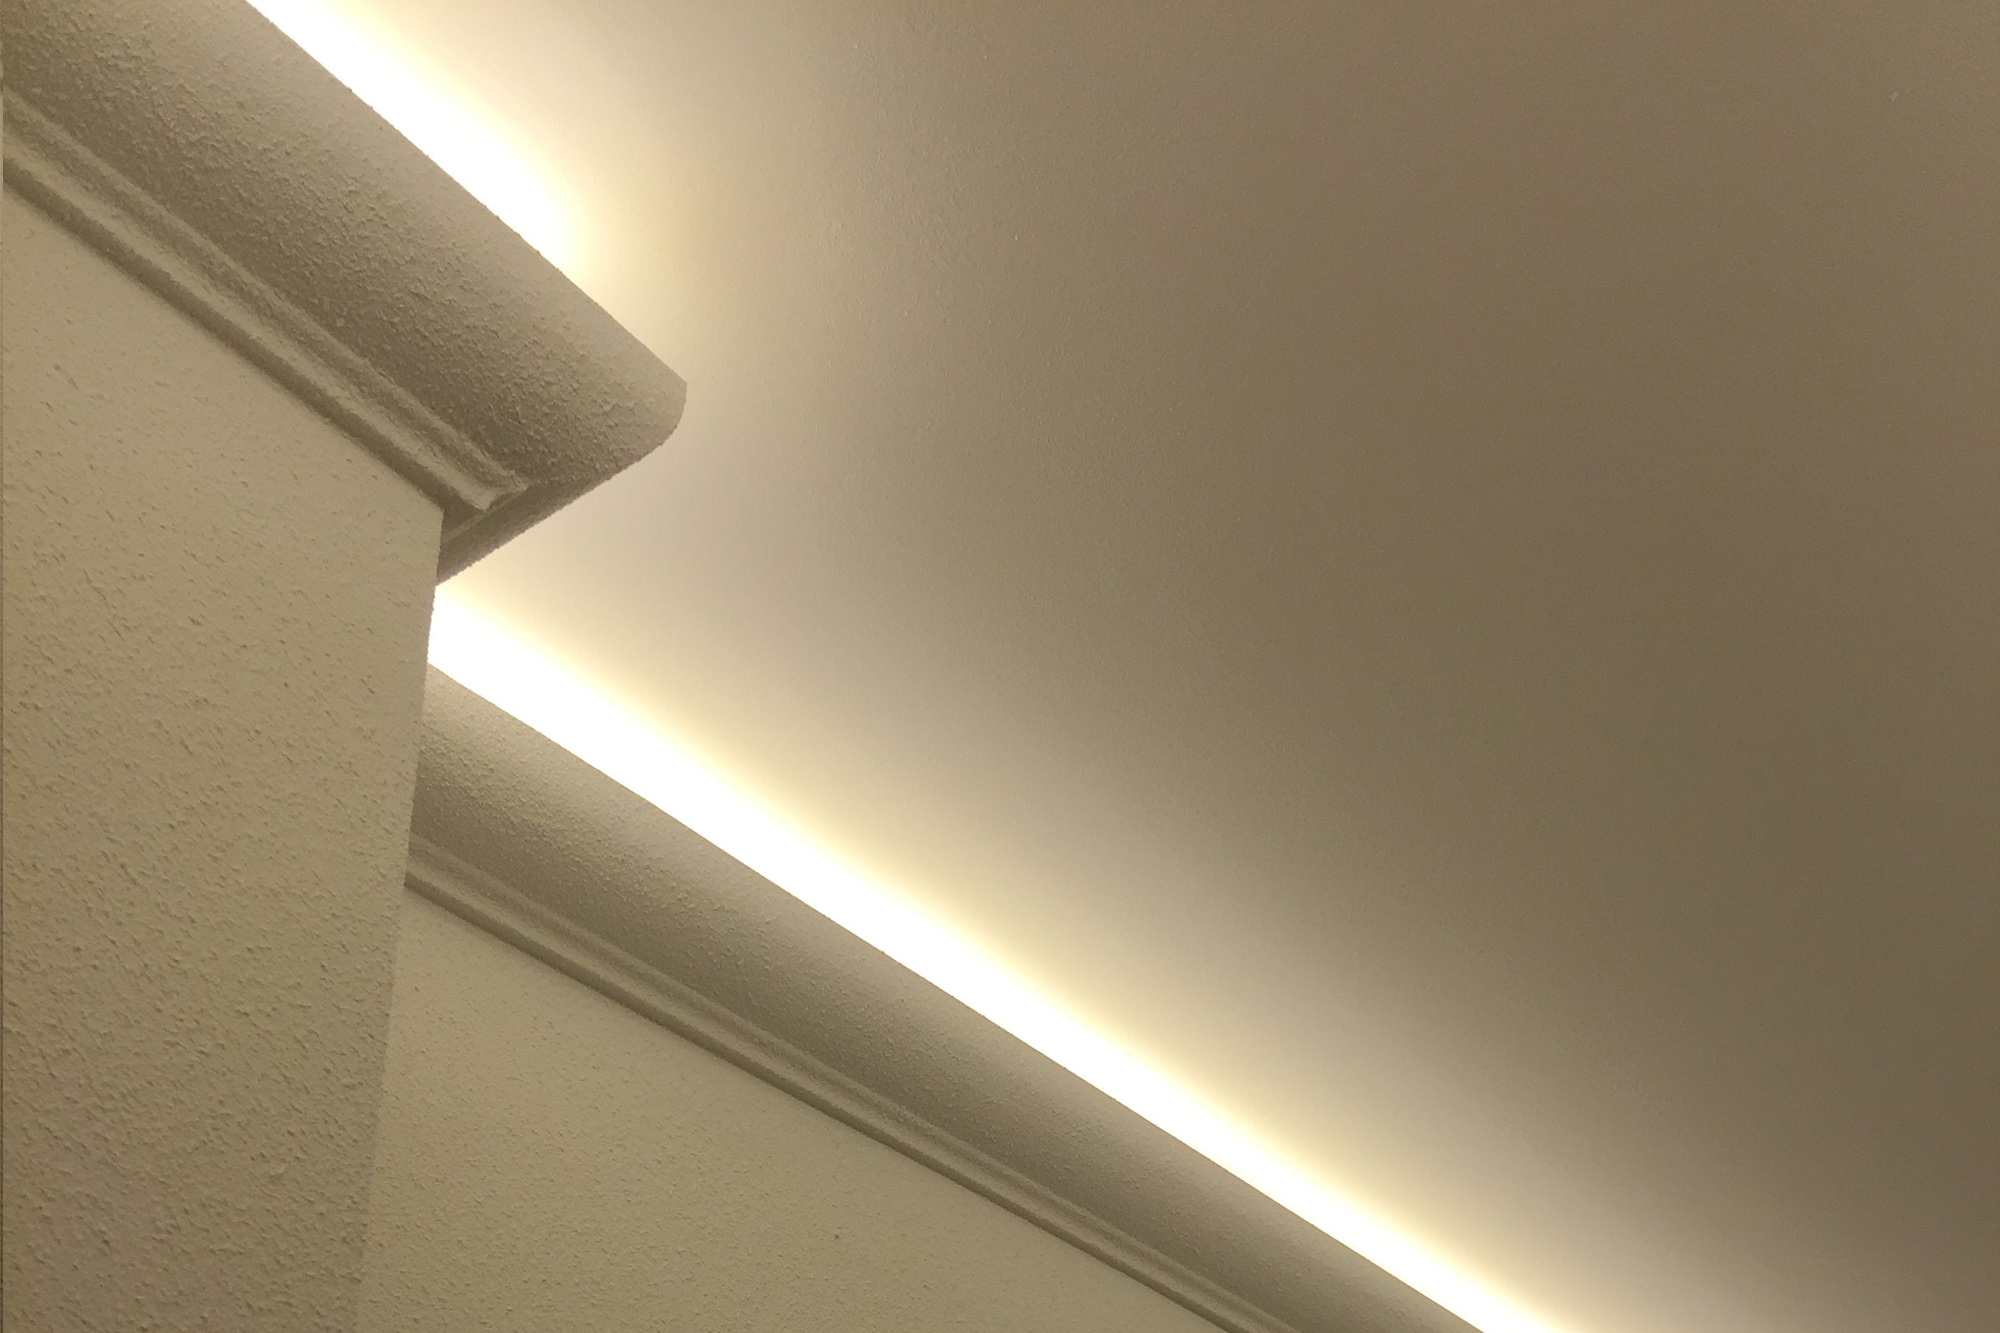 2meter led pu stuckleiste f r indirekte beleuchtung zierleiste sto fest ek led 2 ebay - Indirekte beleuchtung fur fenster ...